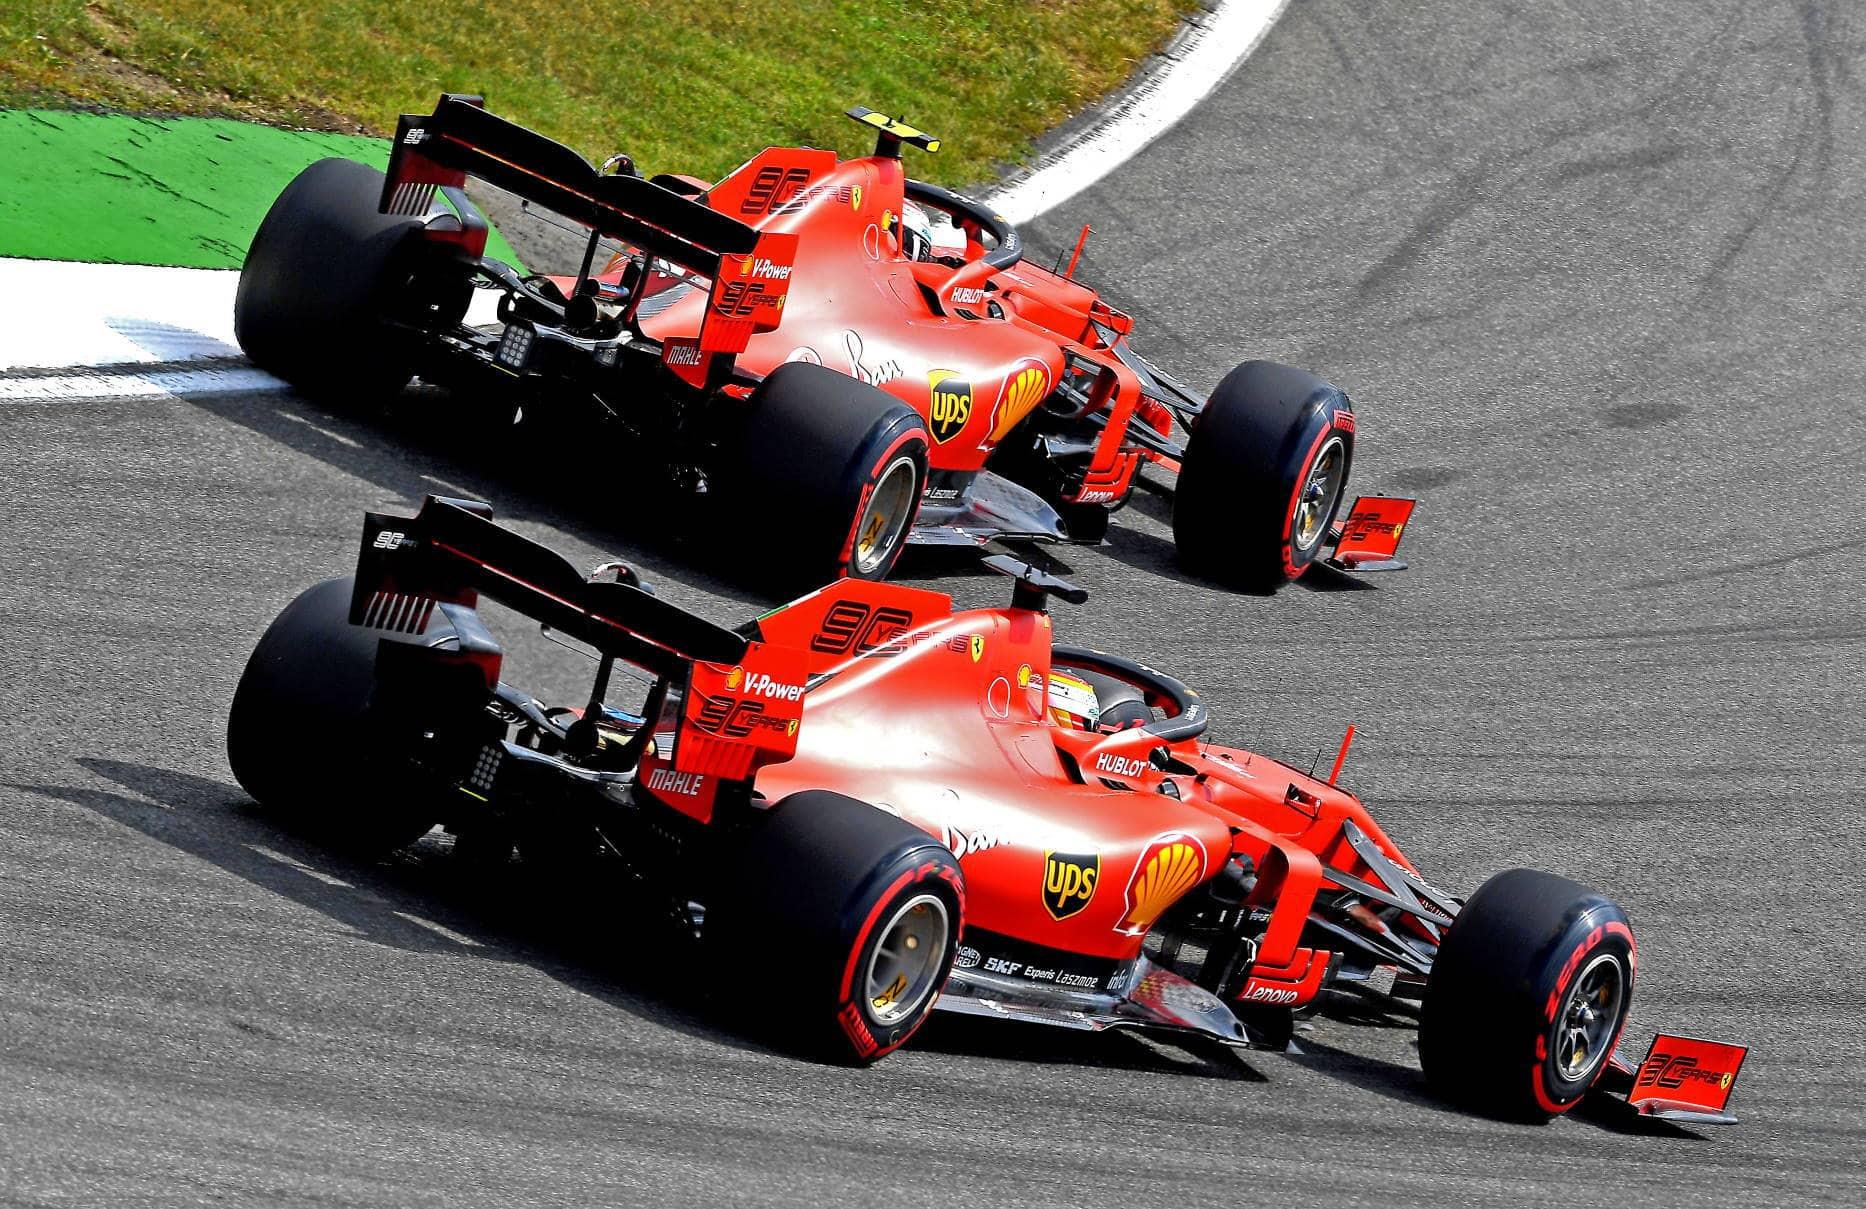 Sebastian-Vettel-Charles-Leclerc-Ferrari-German-GP-F1-2019-Photo-Ferrari